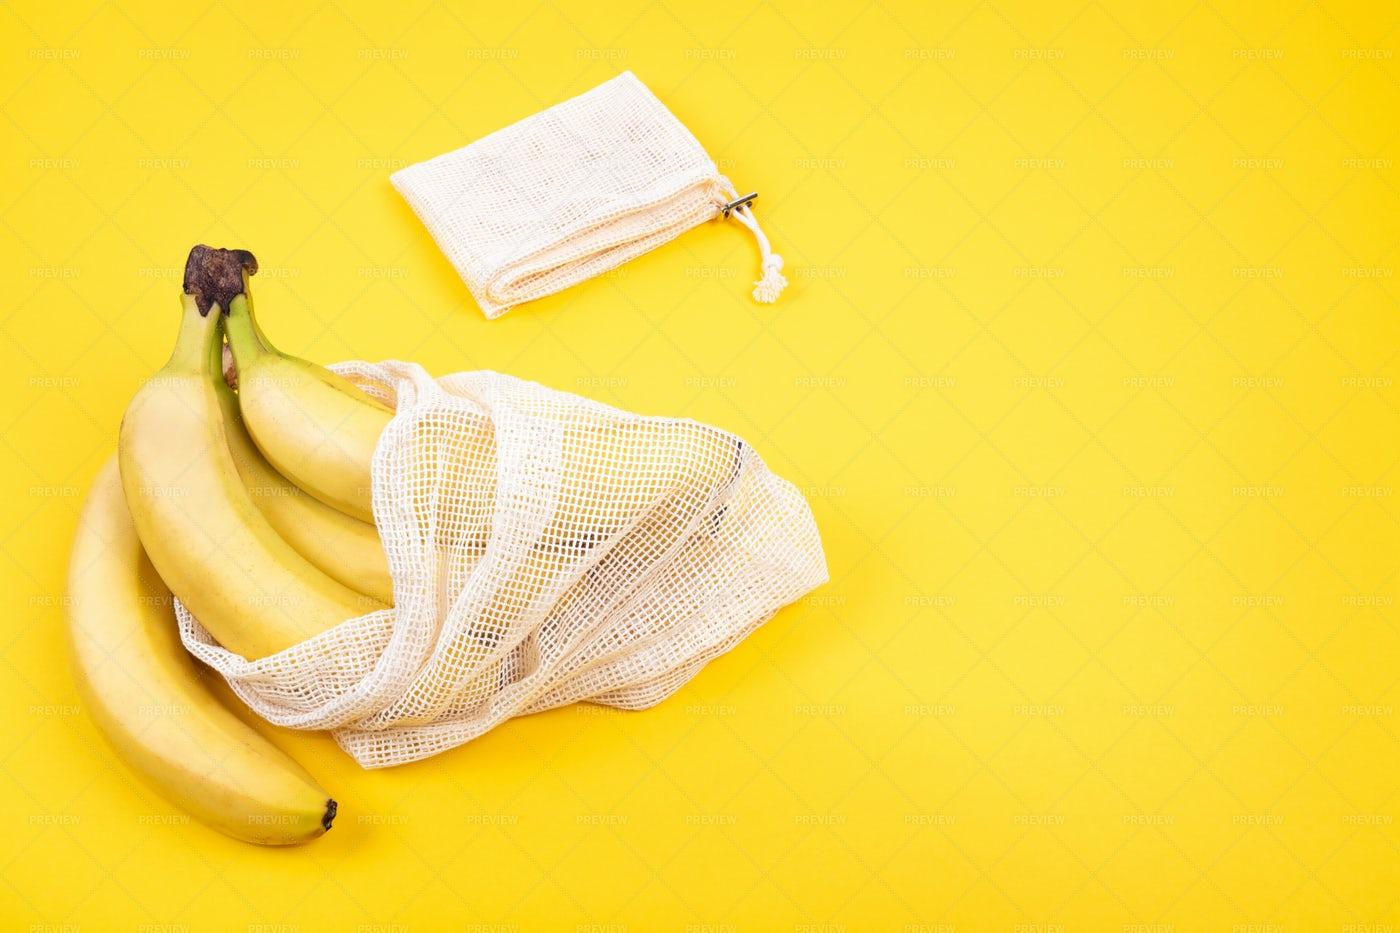 Bananas In Recycled Bag: Stock Photos